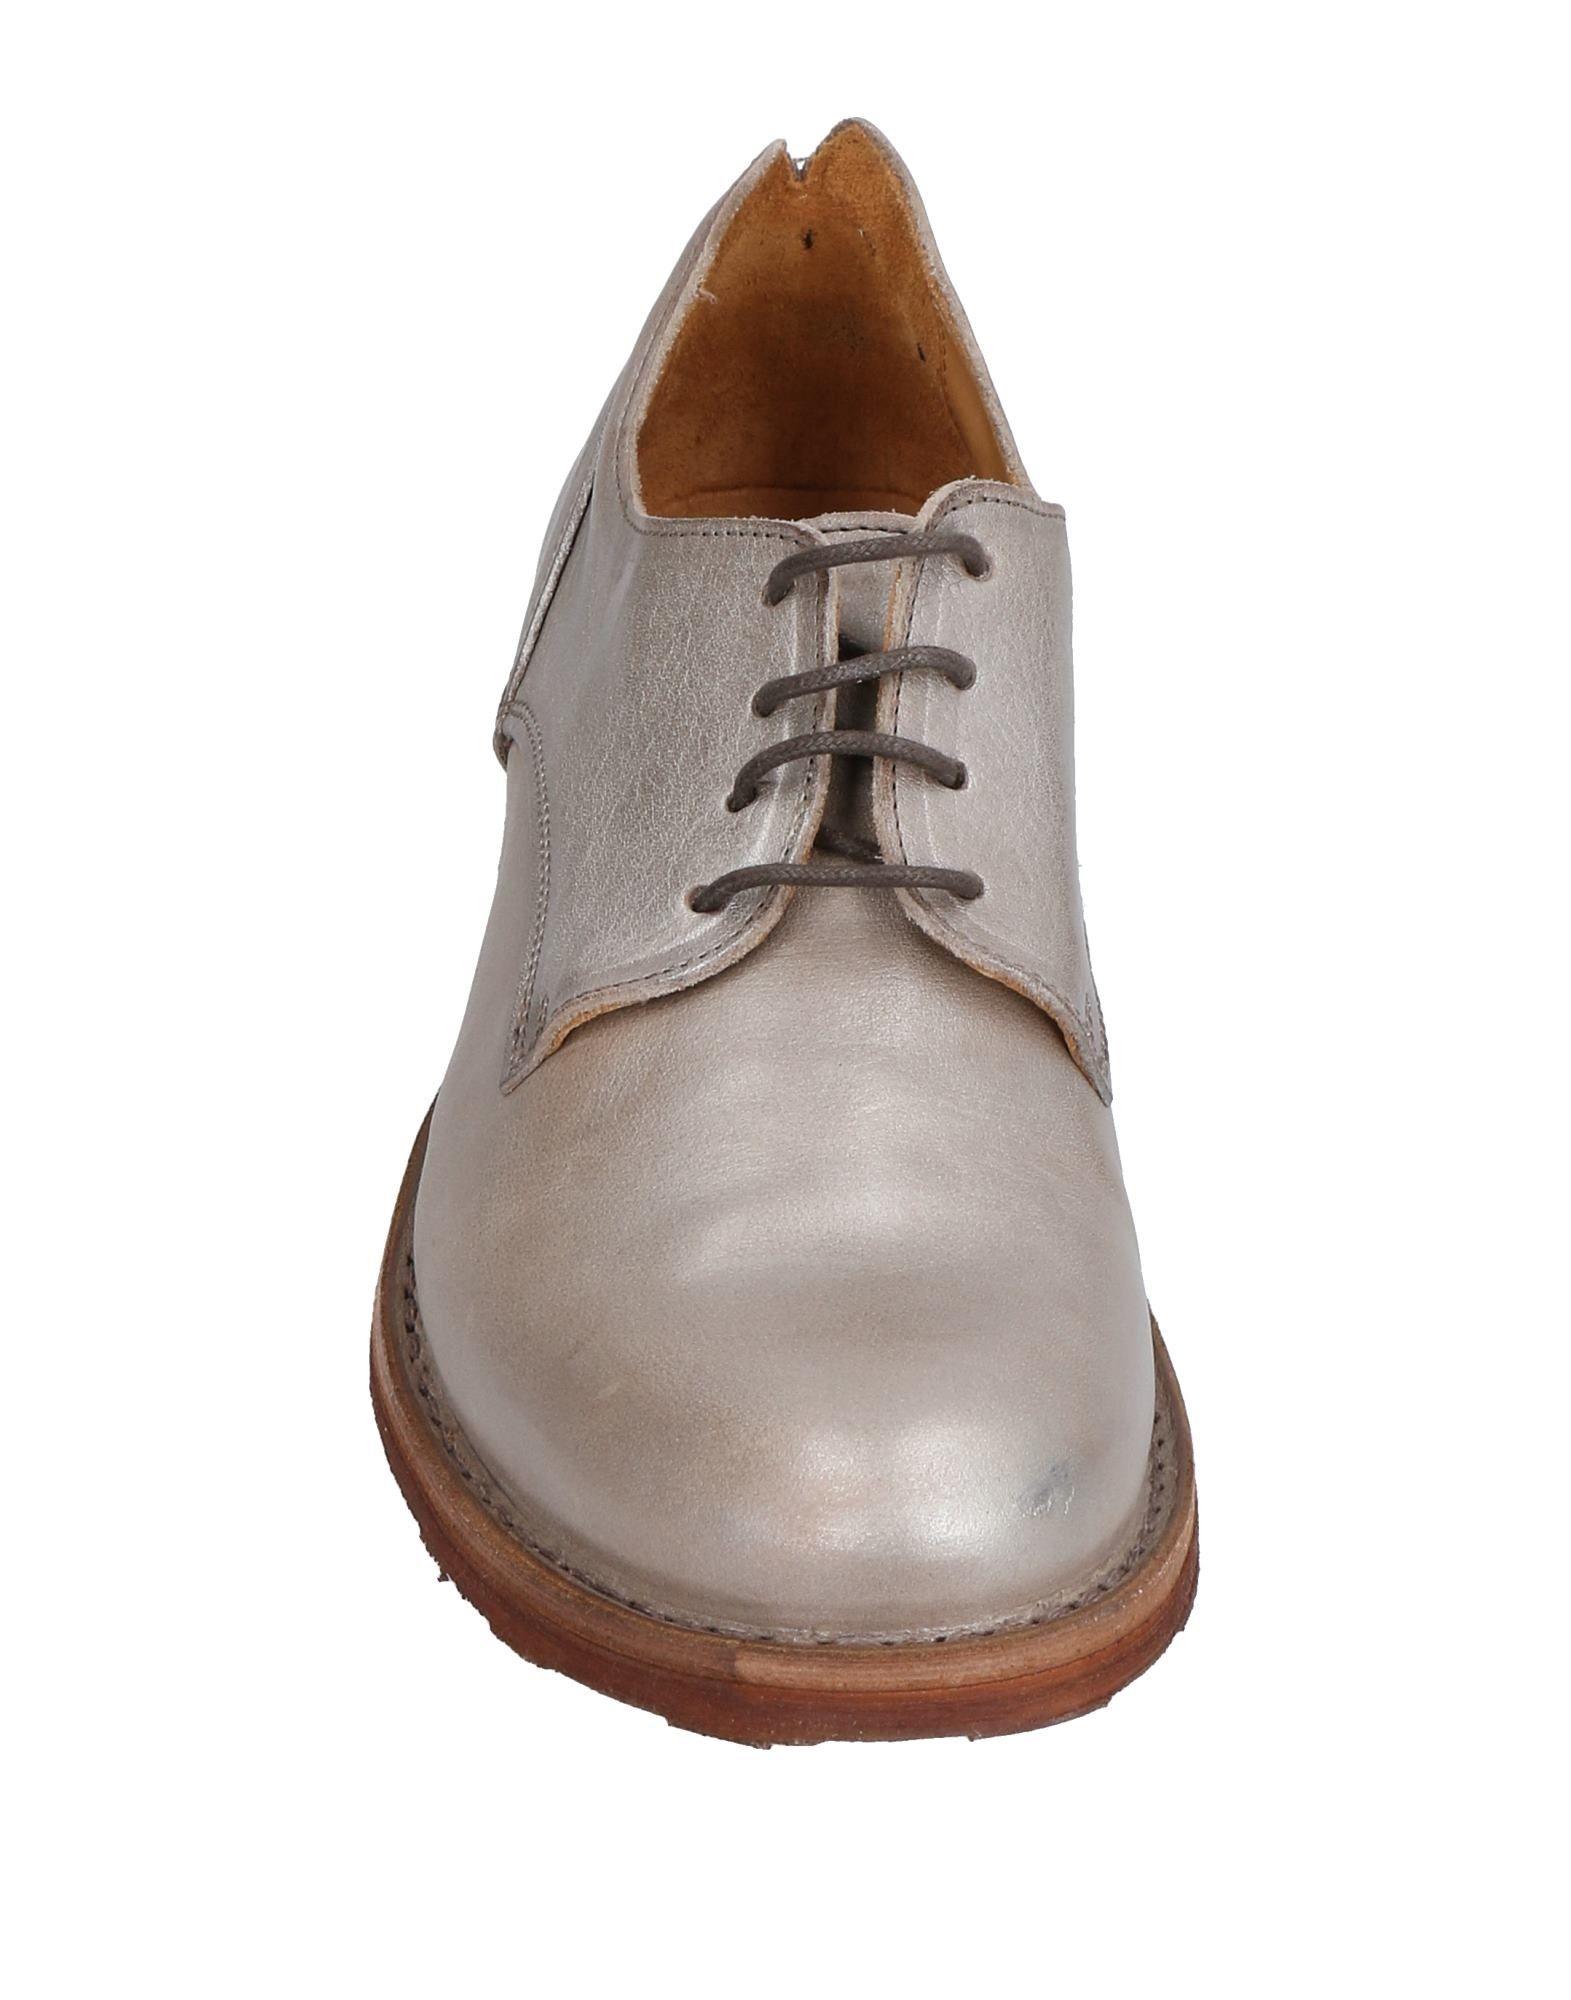 Fiorentini+Baker Schnürschuhe Damen  11500251JQGut aussehende strapazierfähige Schuhe